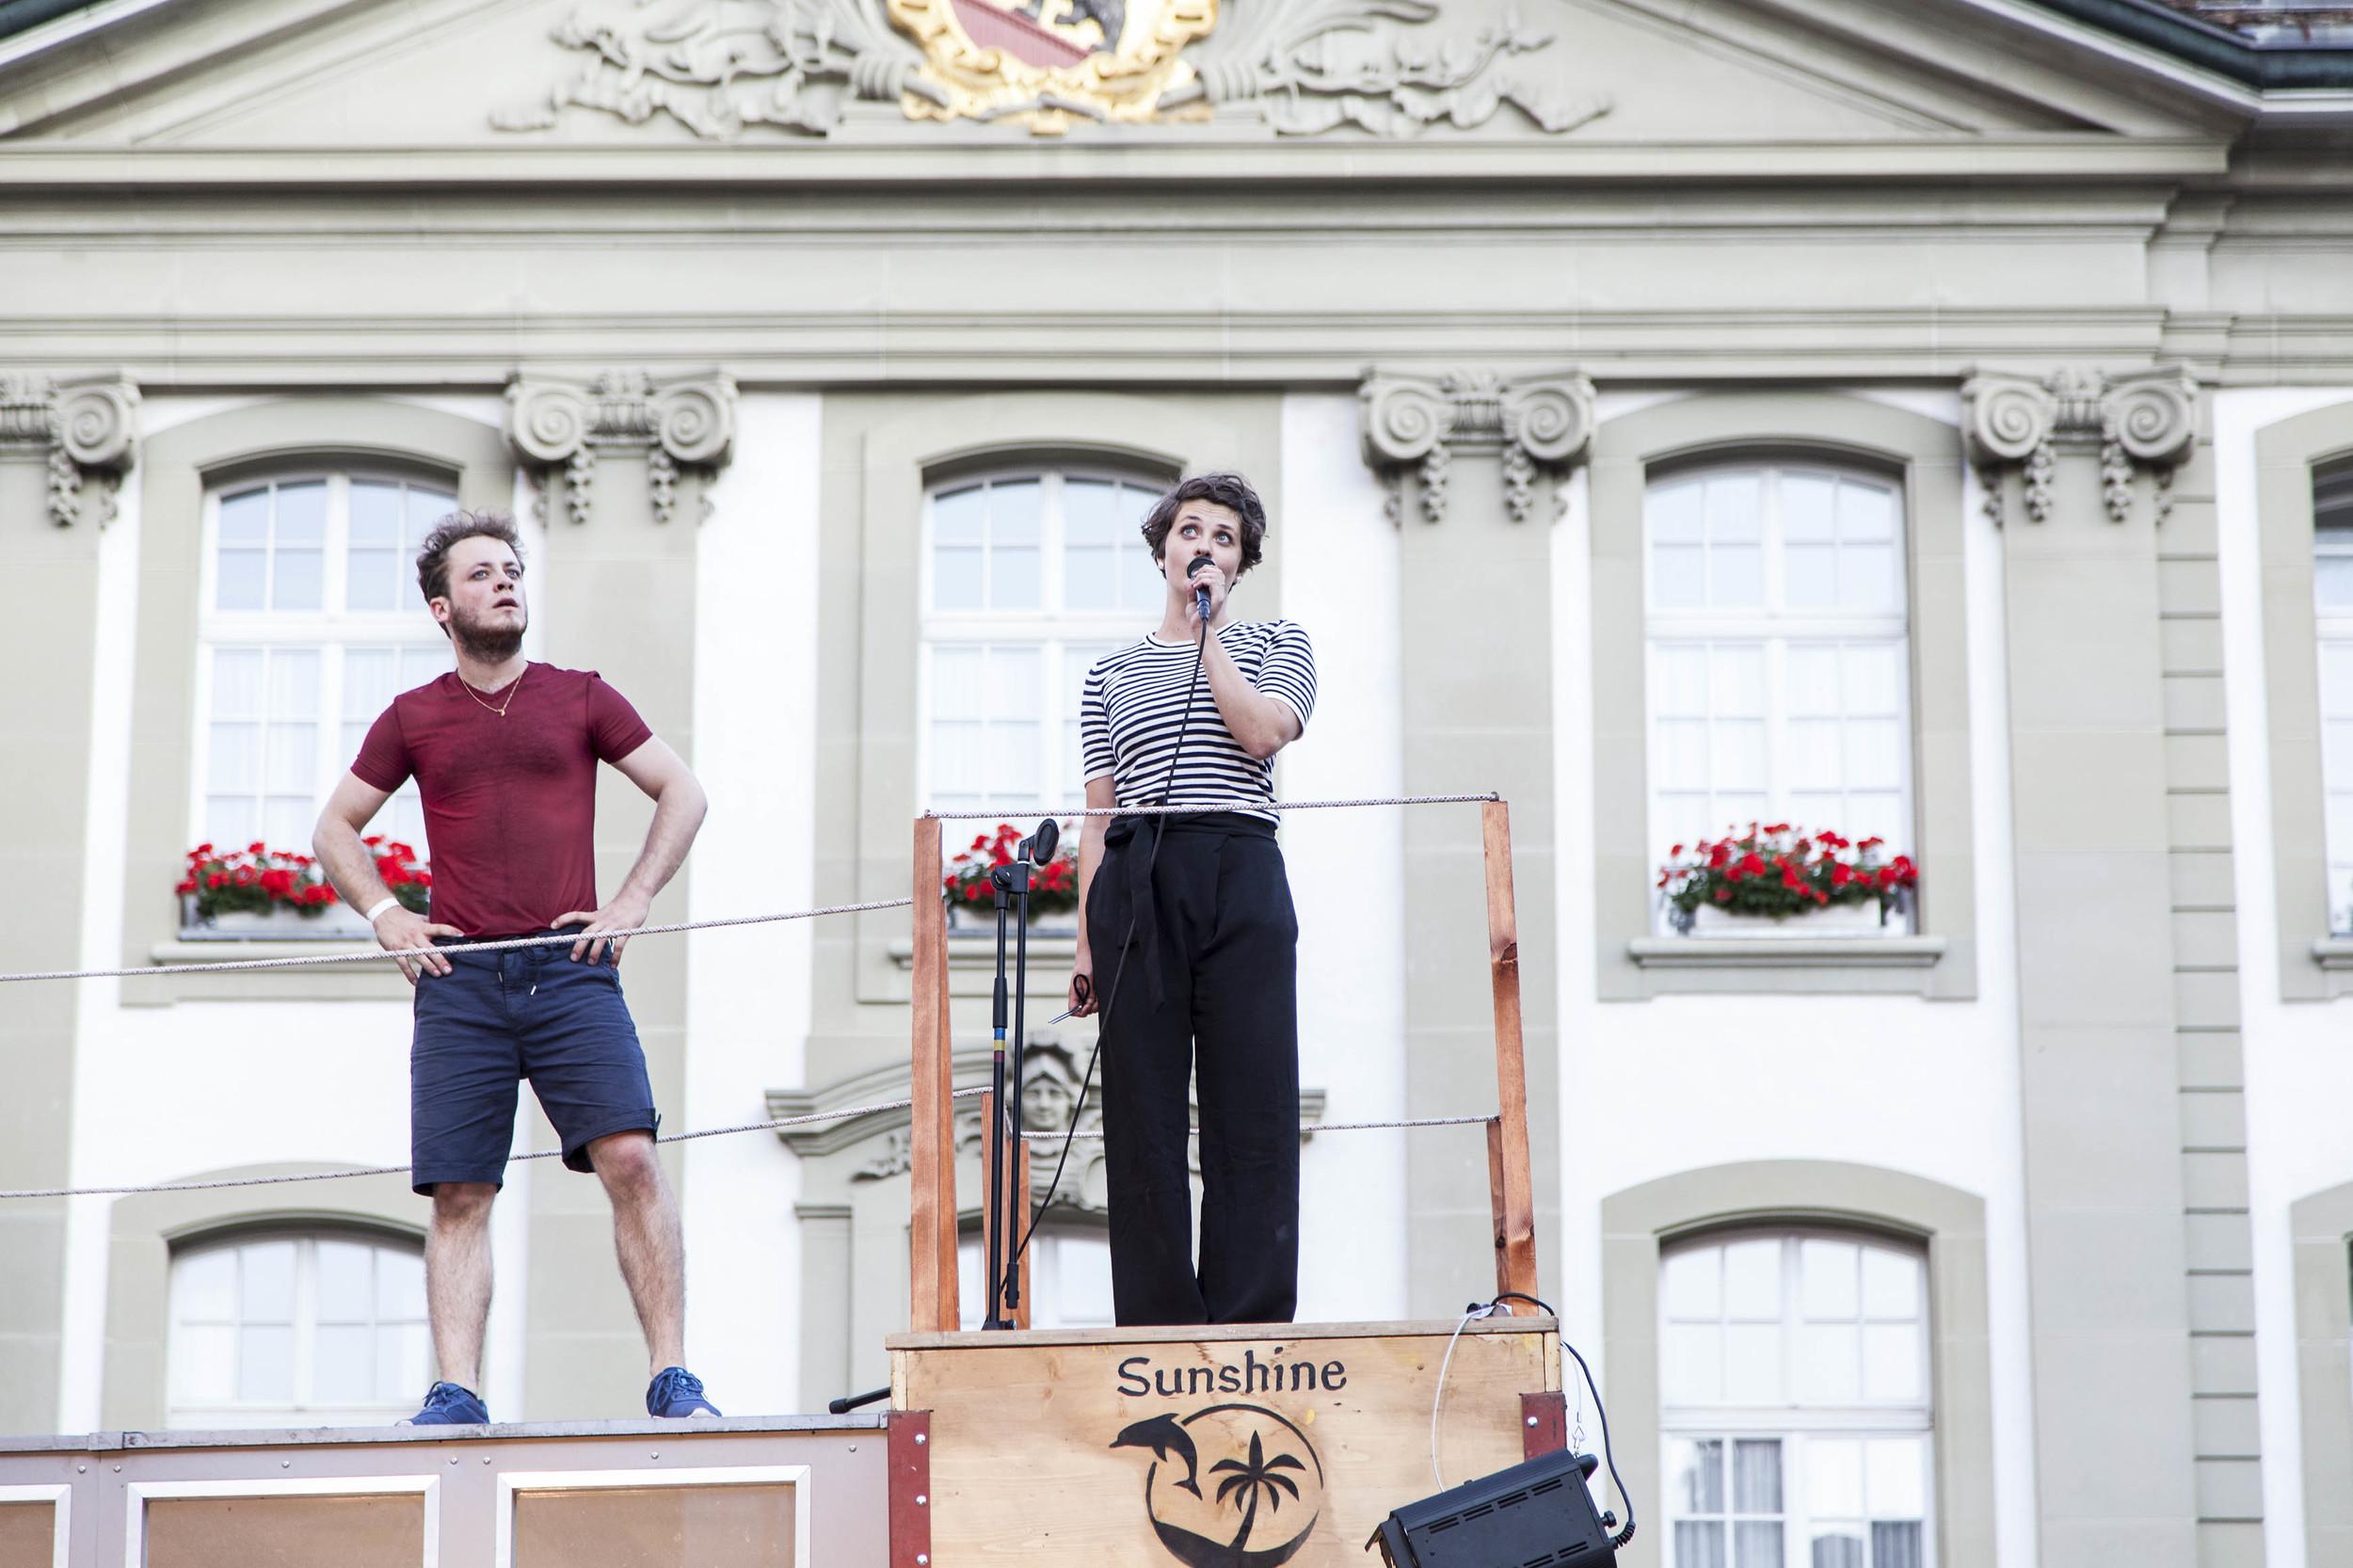 compagnie-trottvoir-2015-sofort-savoire-vivre_show_14.jpg